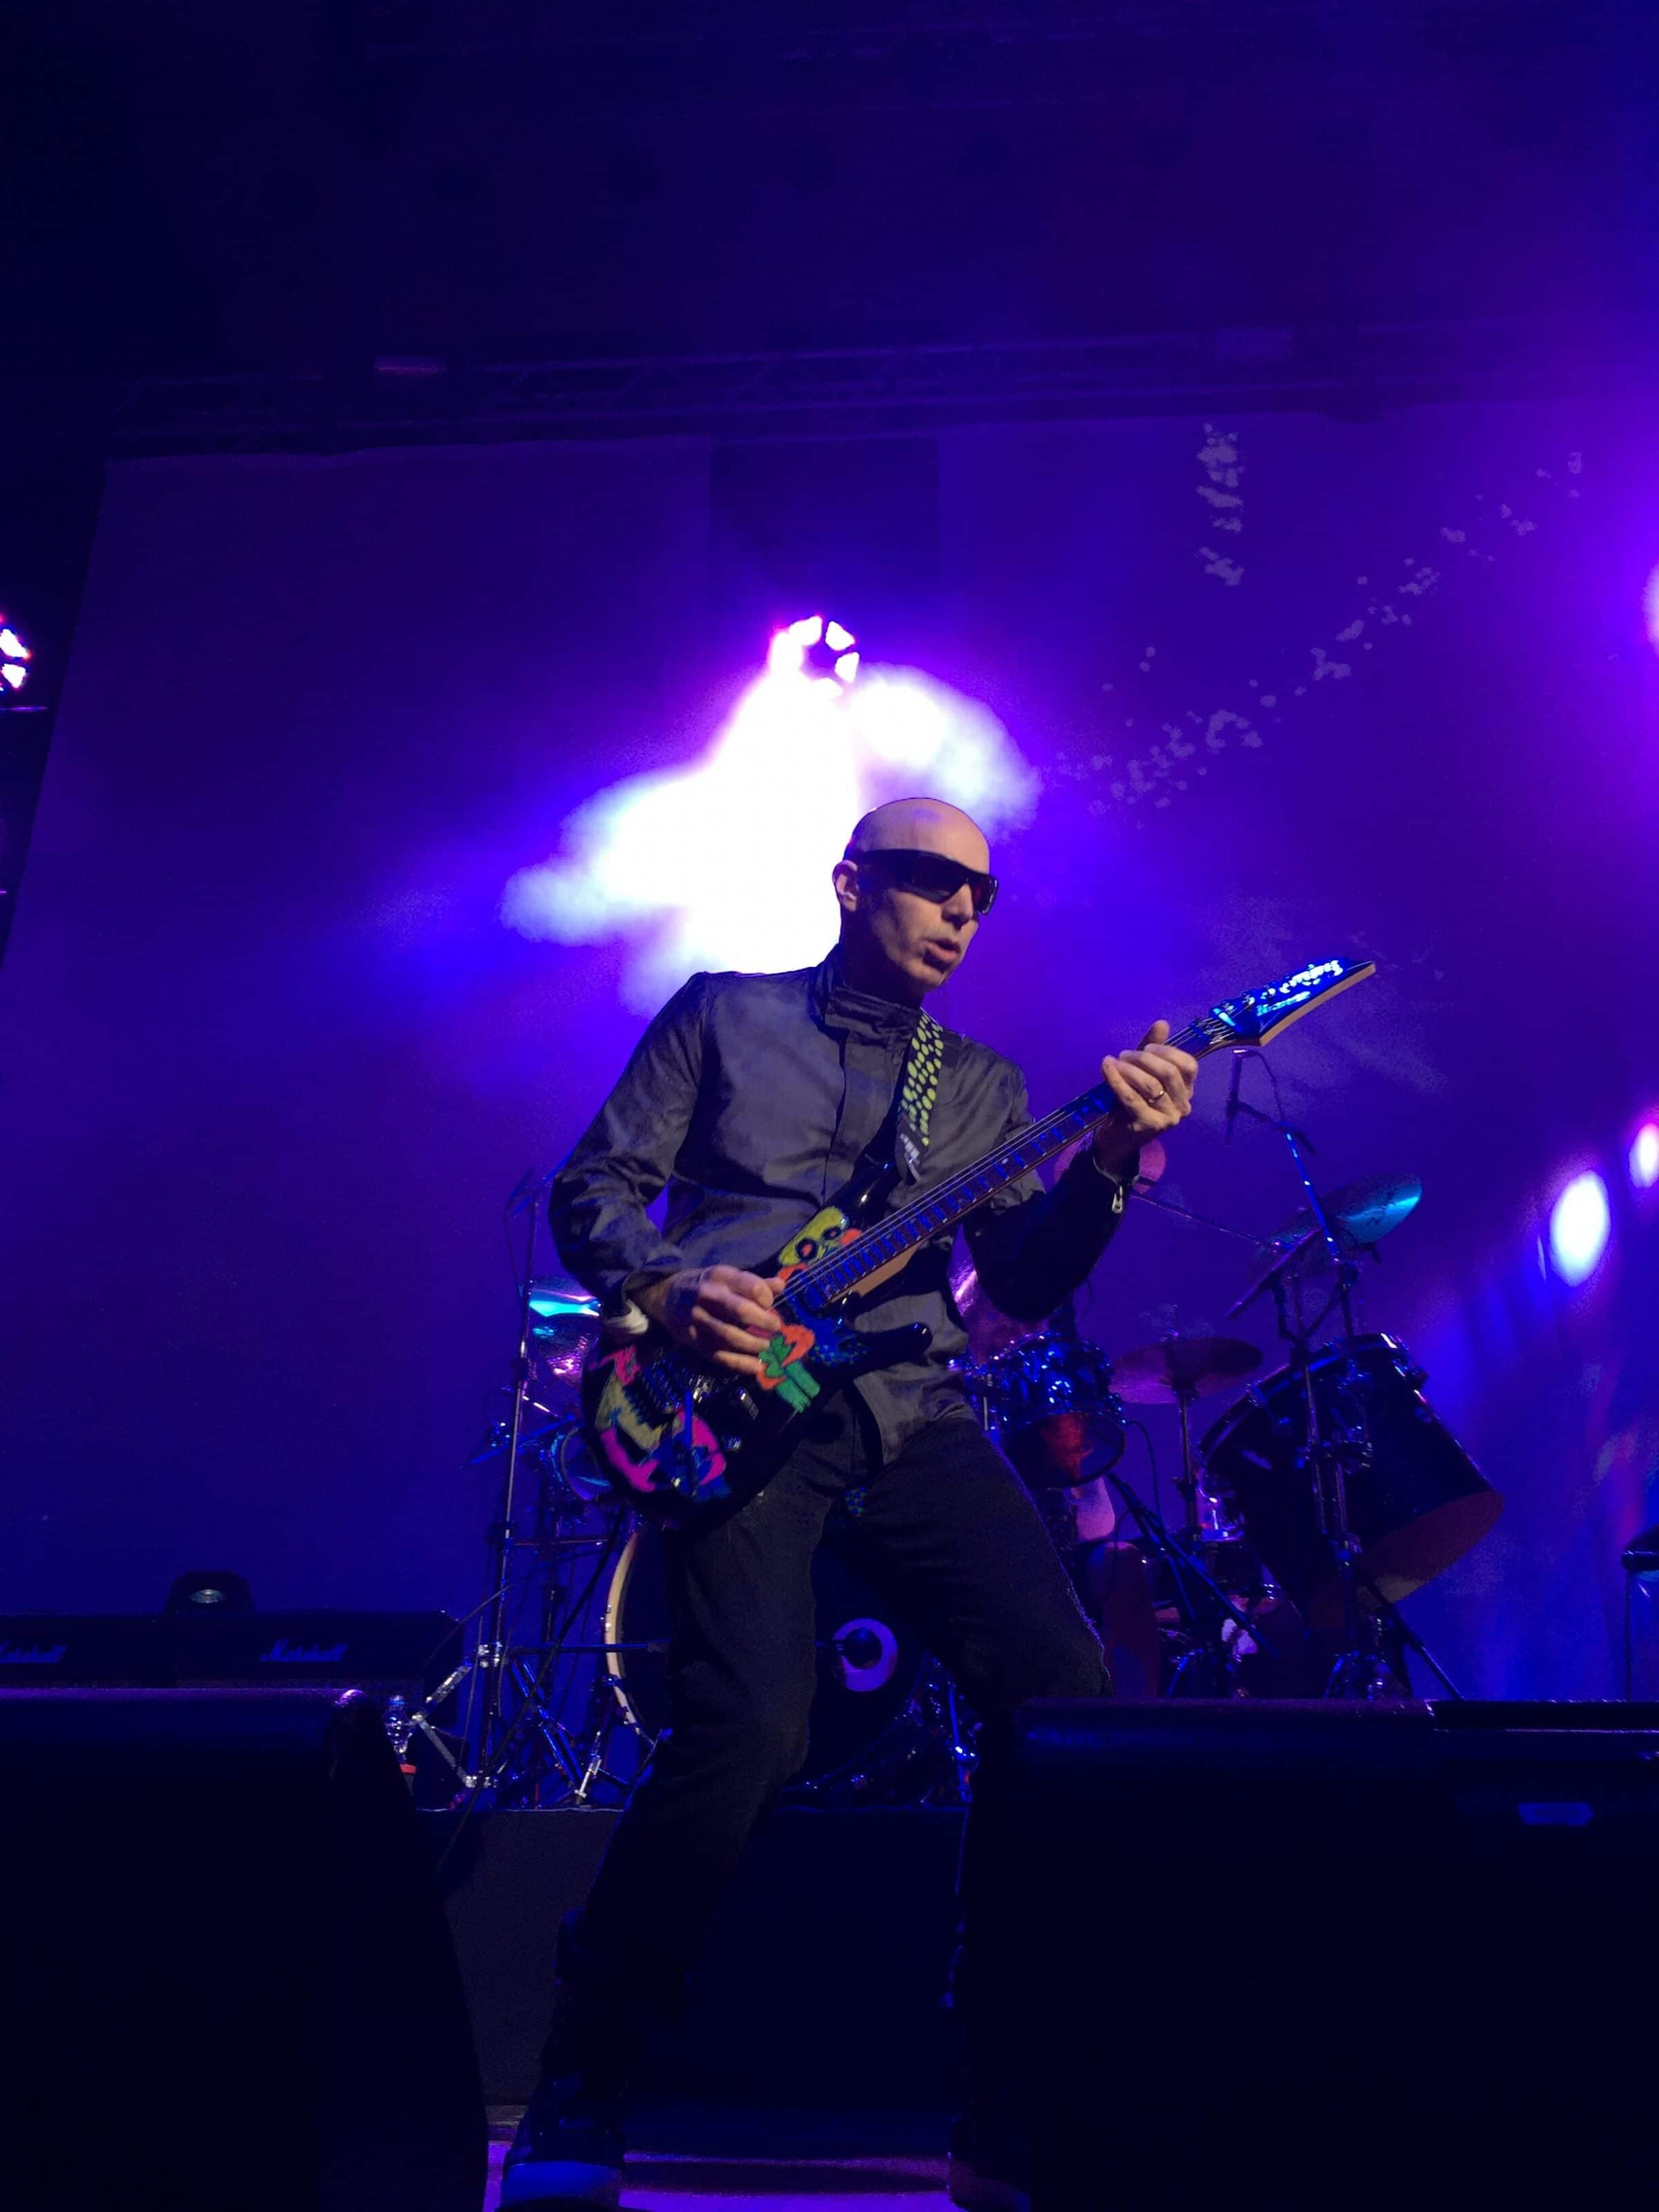 the fan experience joe satriani ibanez js25art 2015 live